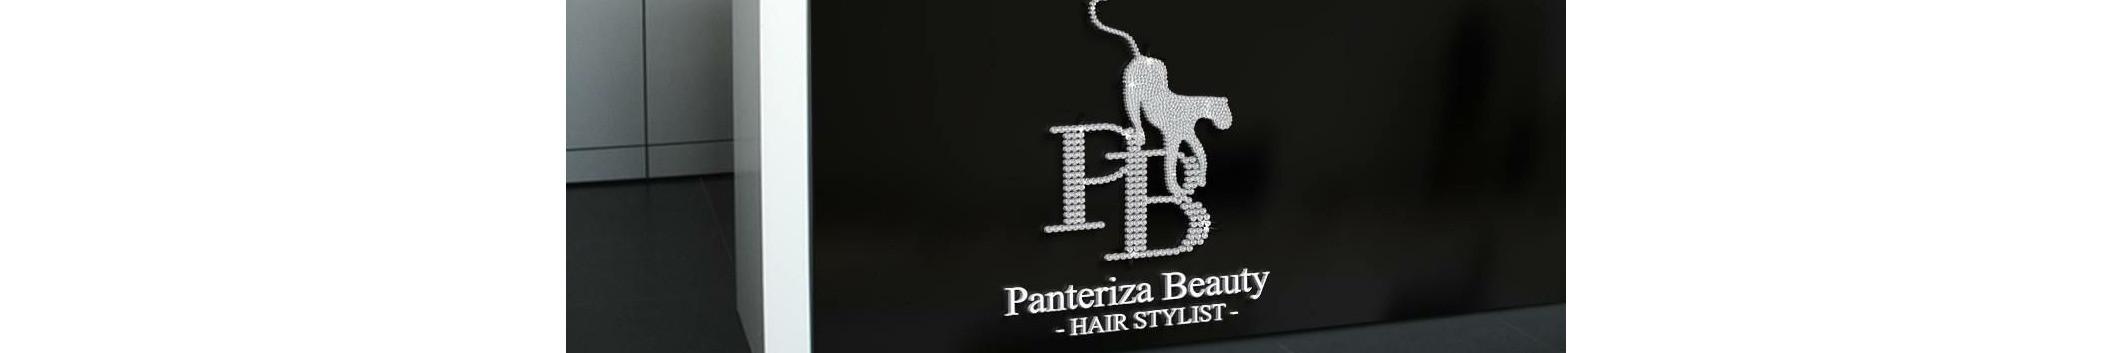 Hairdresser Marbella Nueva Andaliucia